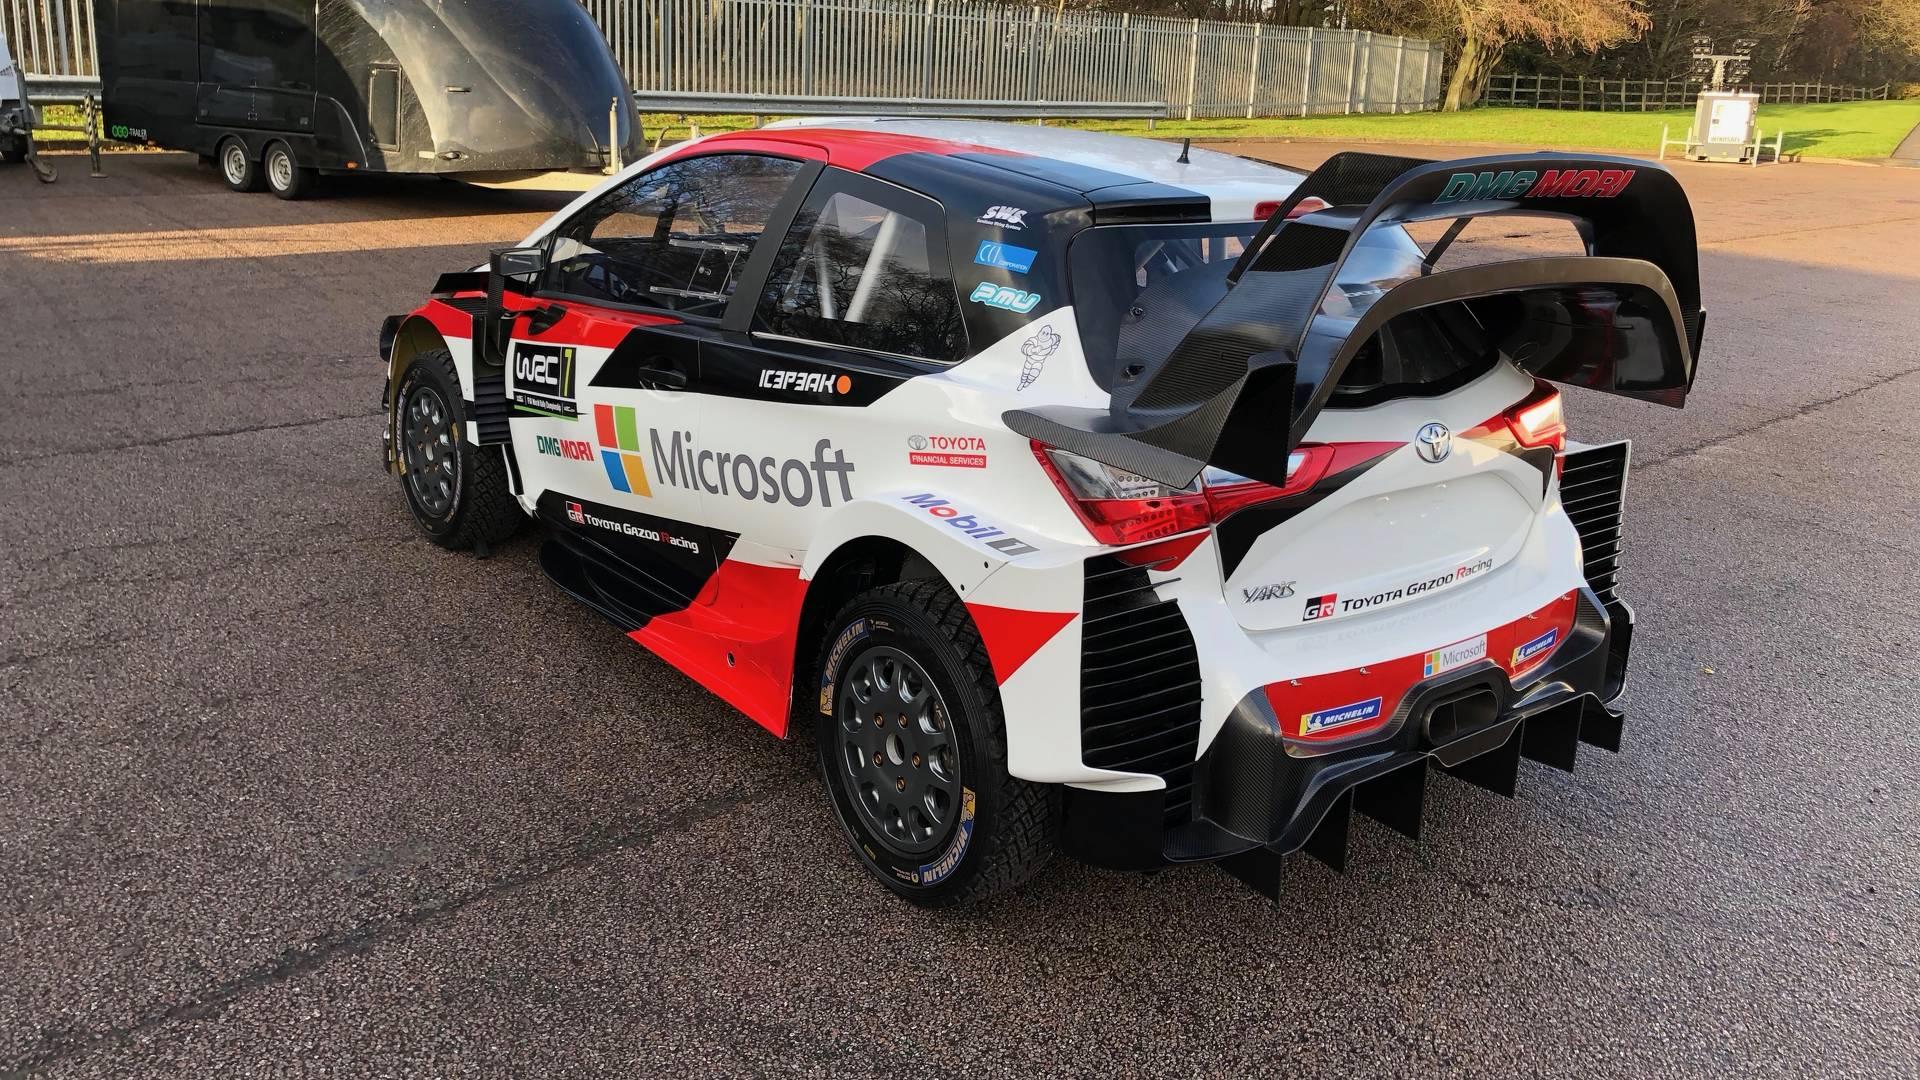 2018 Wrc Cars Revealed At Autosport International